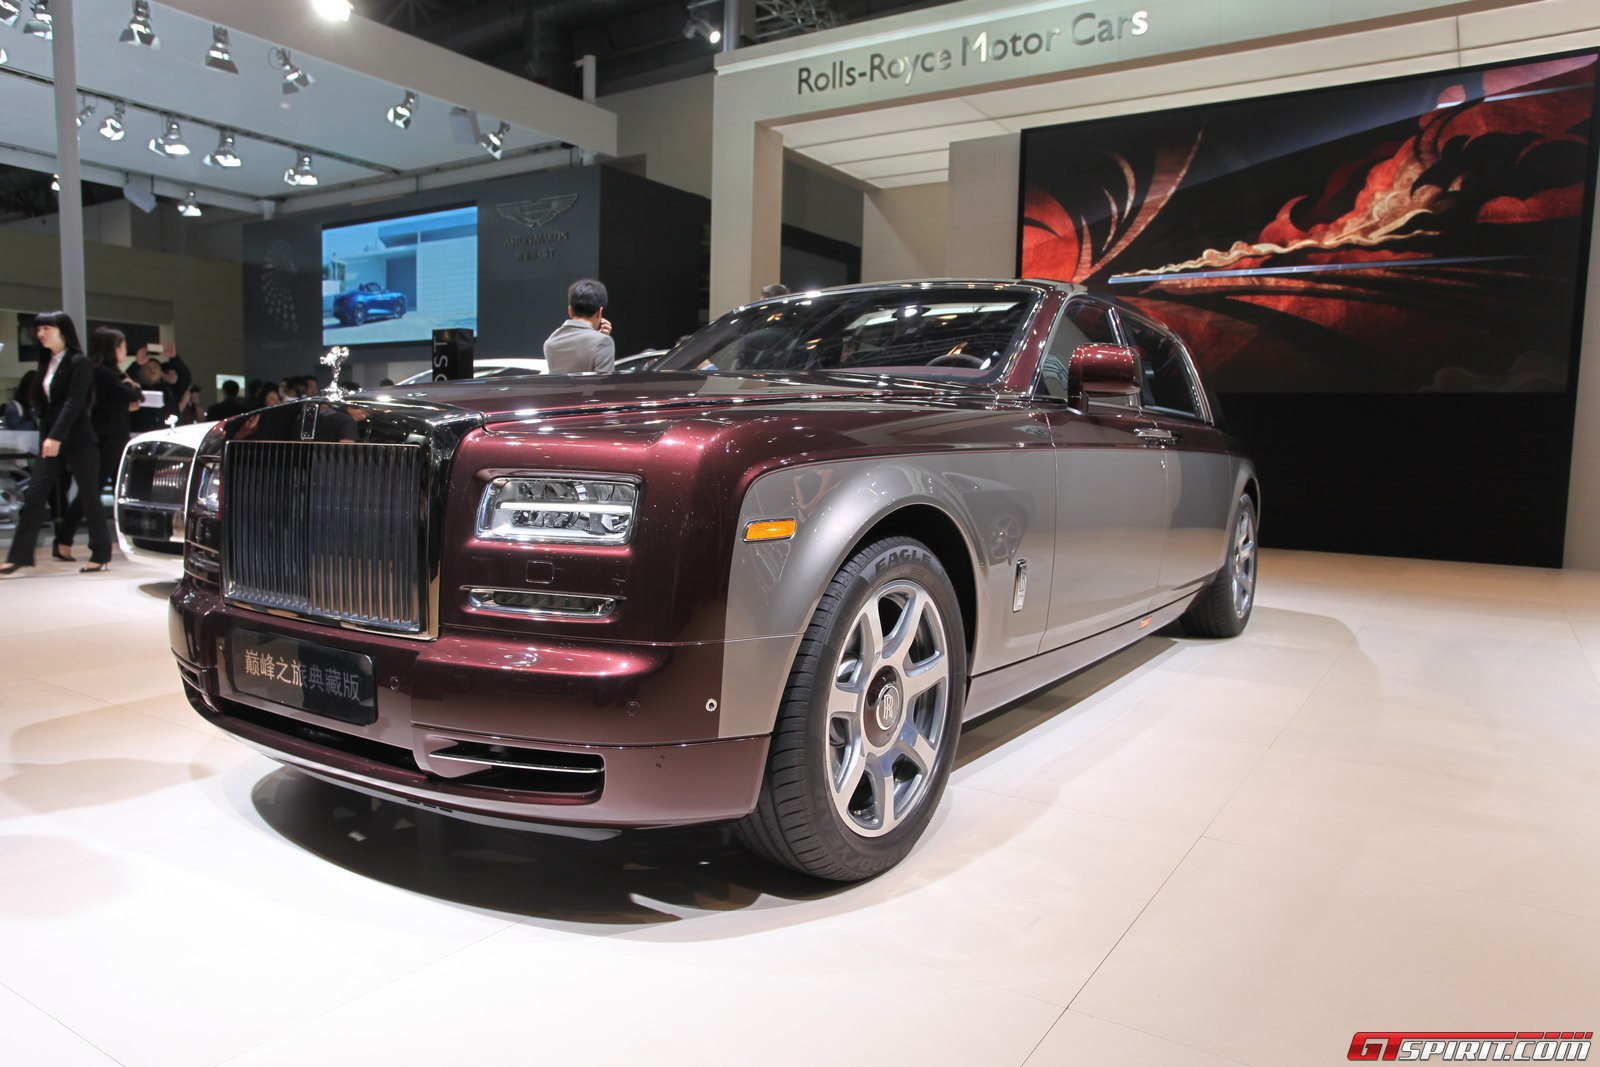 Auto china 2014 rolls royce pinnacle travel phantom for Rolls royce phantom motor